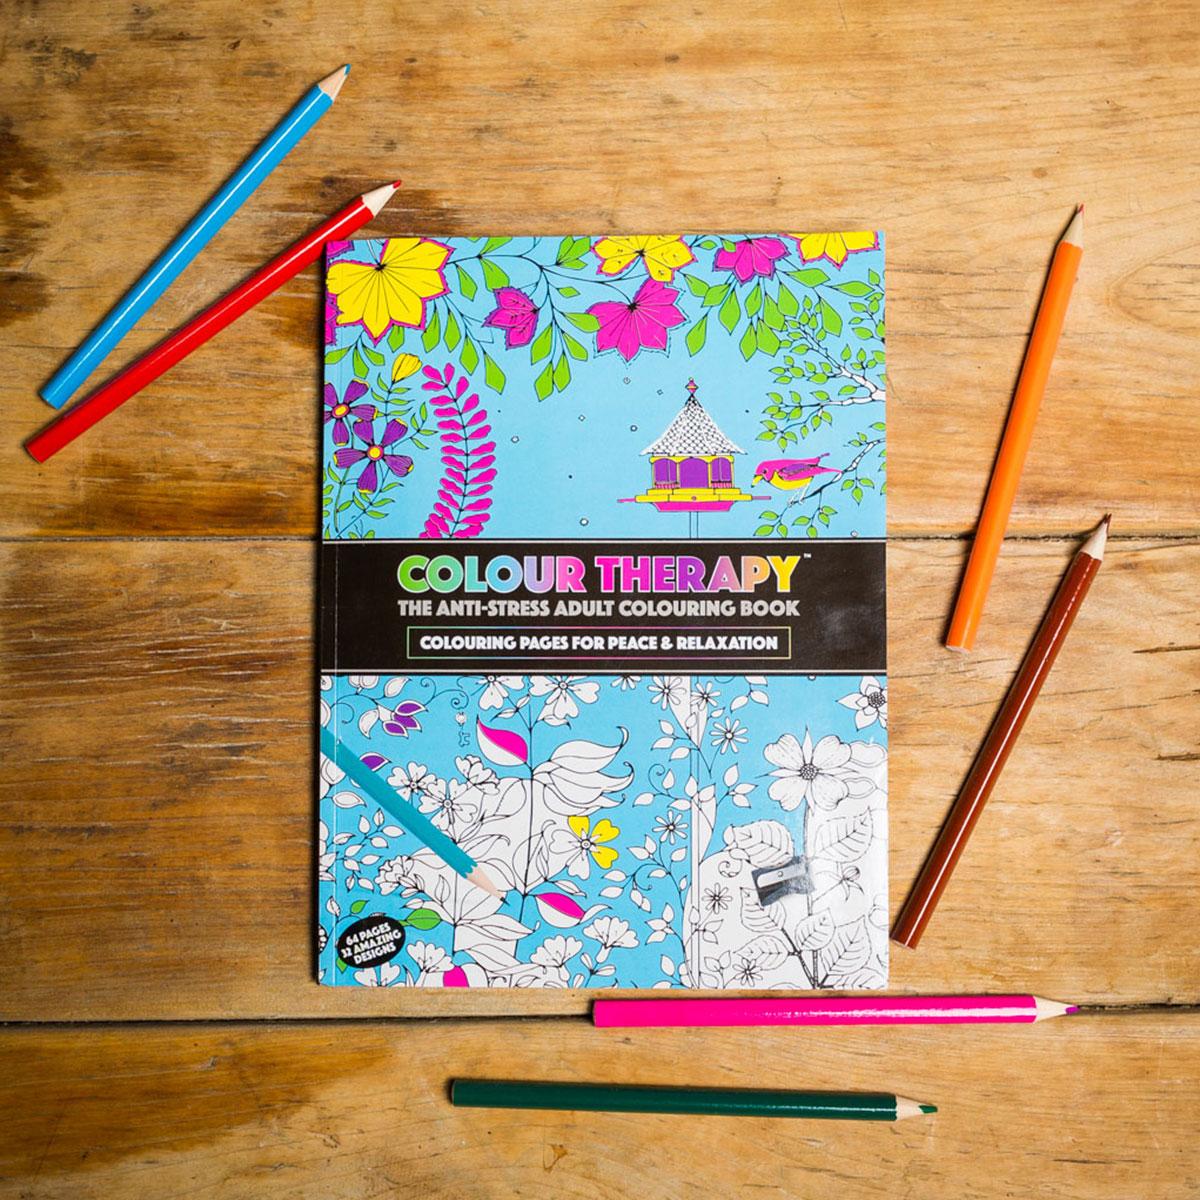 Malbuch Farb Therapie Gegen Stress